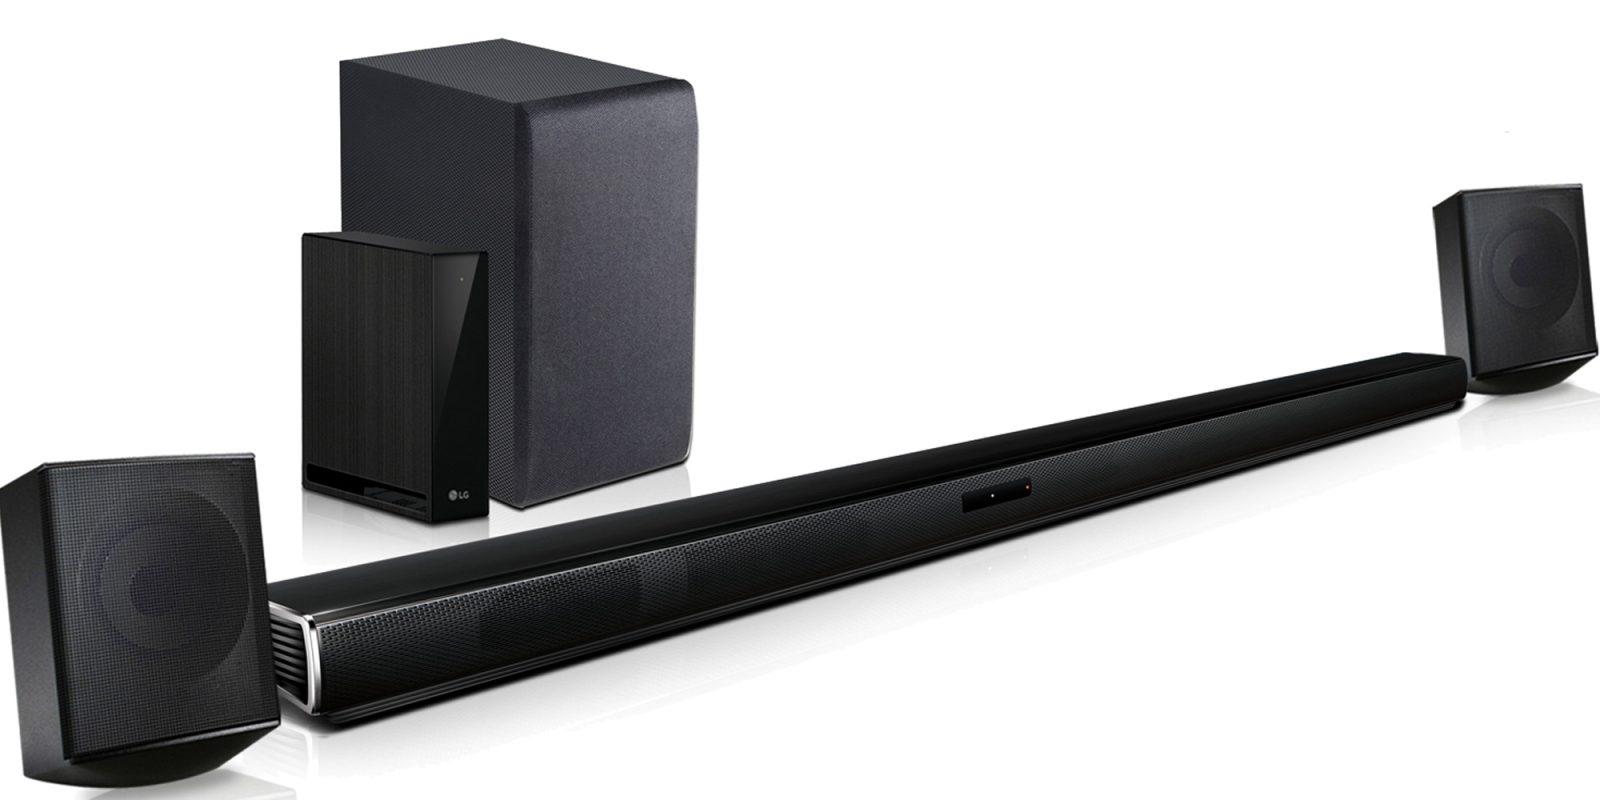 Upgrade To A 4 1 Ch Lg Soundbar W Sub Wireless Rear Speakers 150 Reg 200